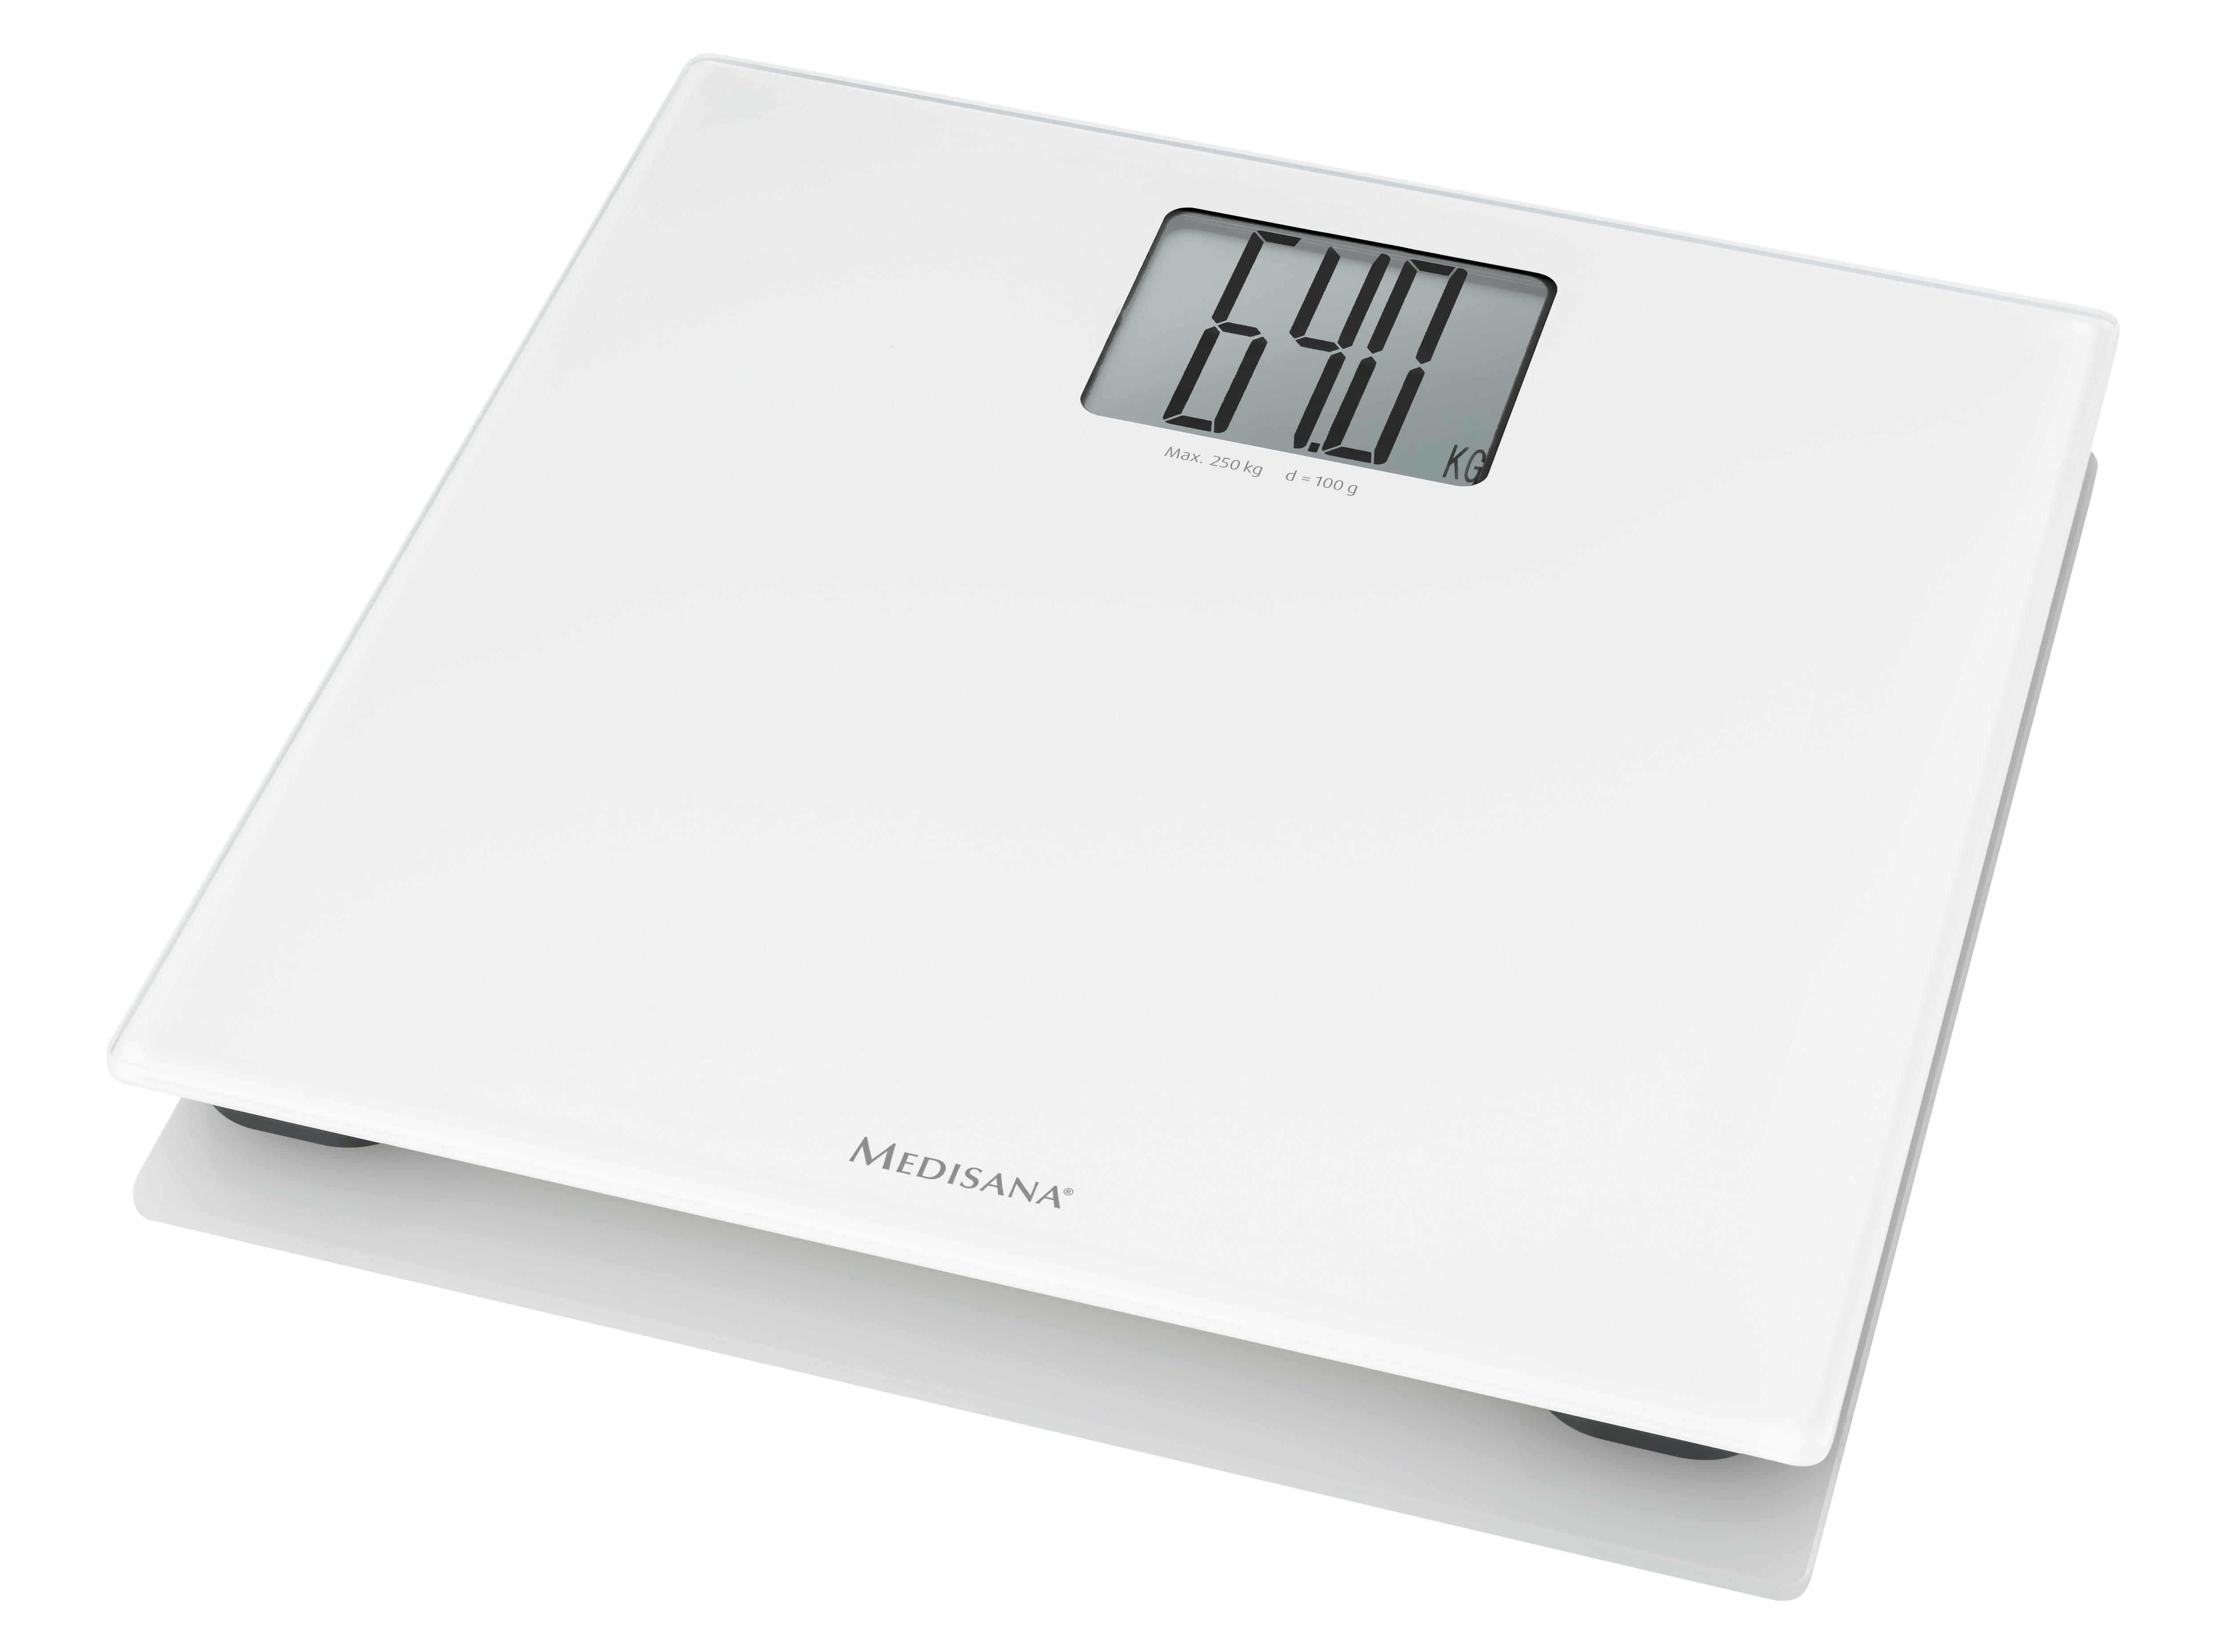 Medisana Ψηφιακή Ζυγαριά PS 470 XL Λευκή 250kg